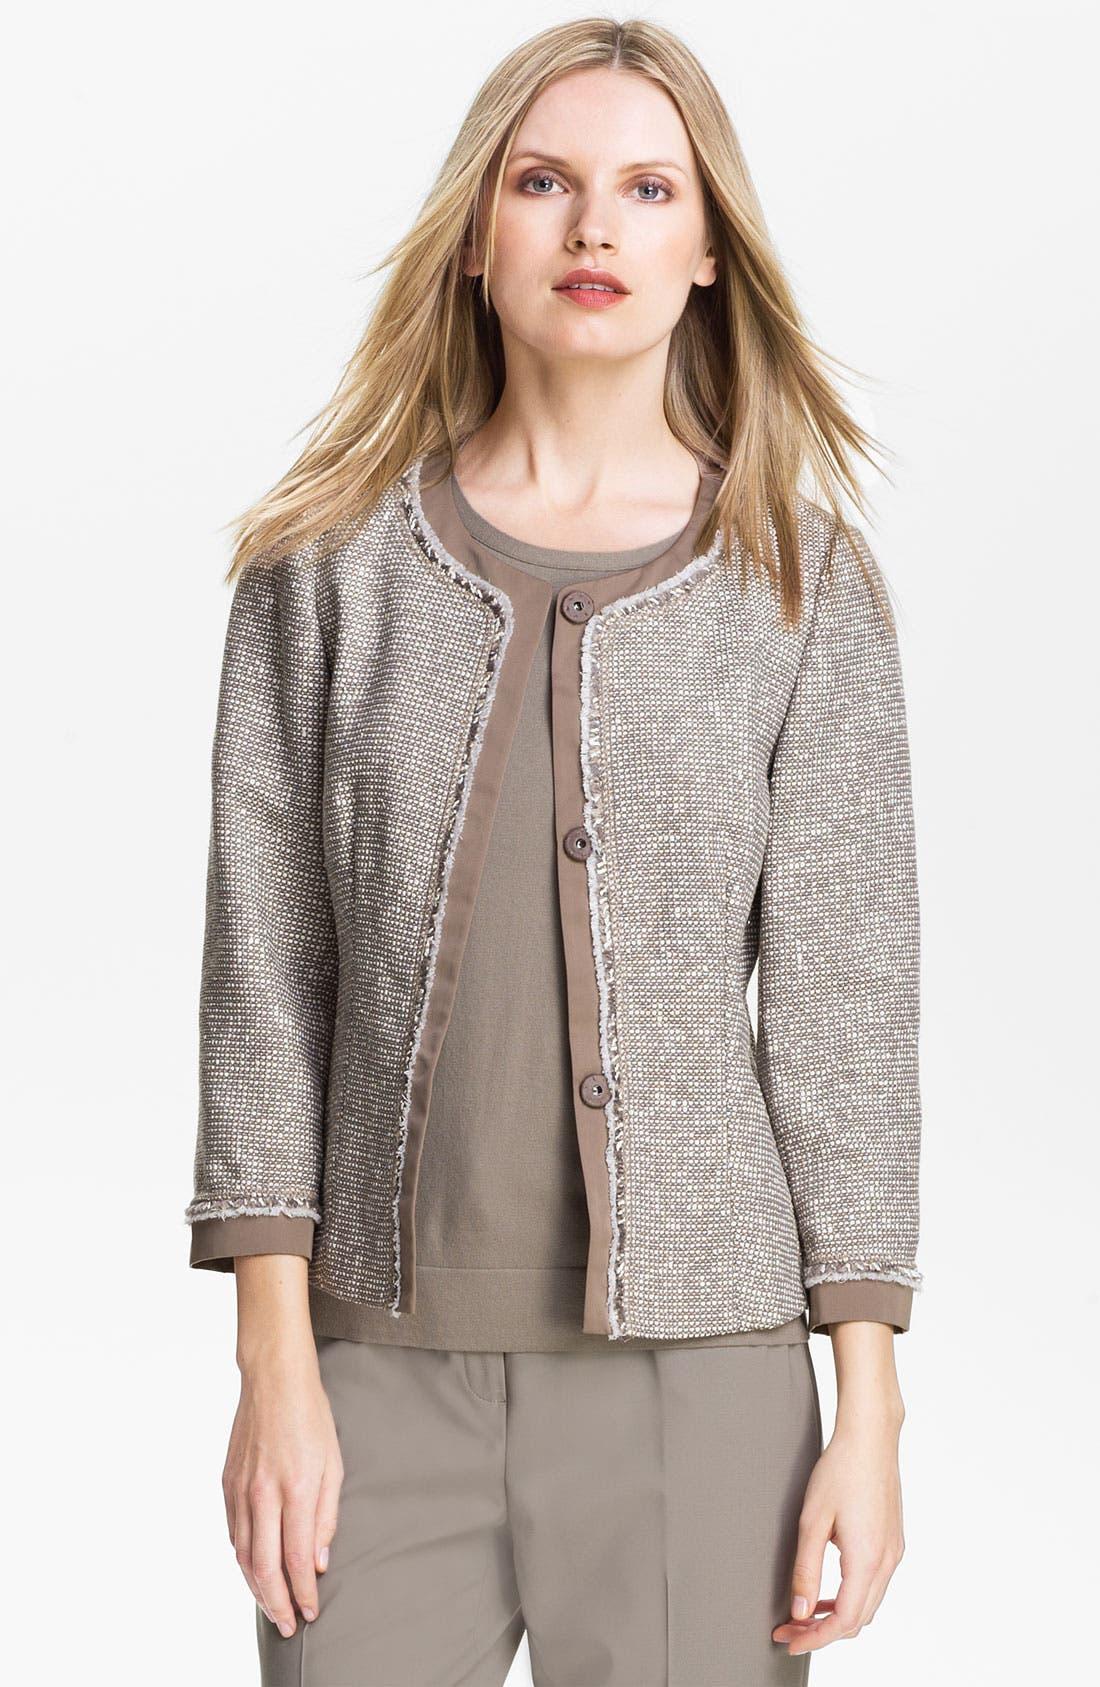 Alternate Image 1 Selected - Lafayette 148 New York 'Antonia' Tweed Jacket